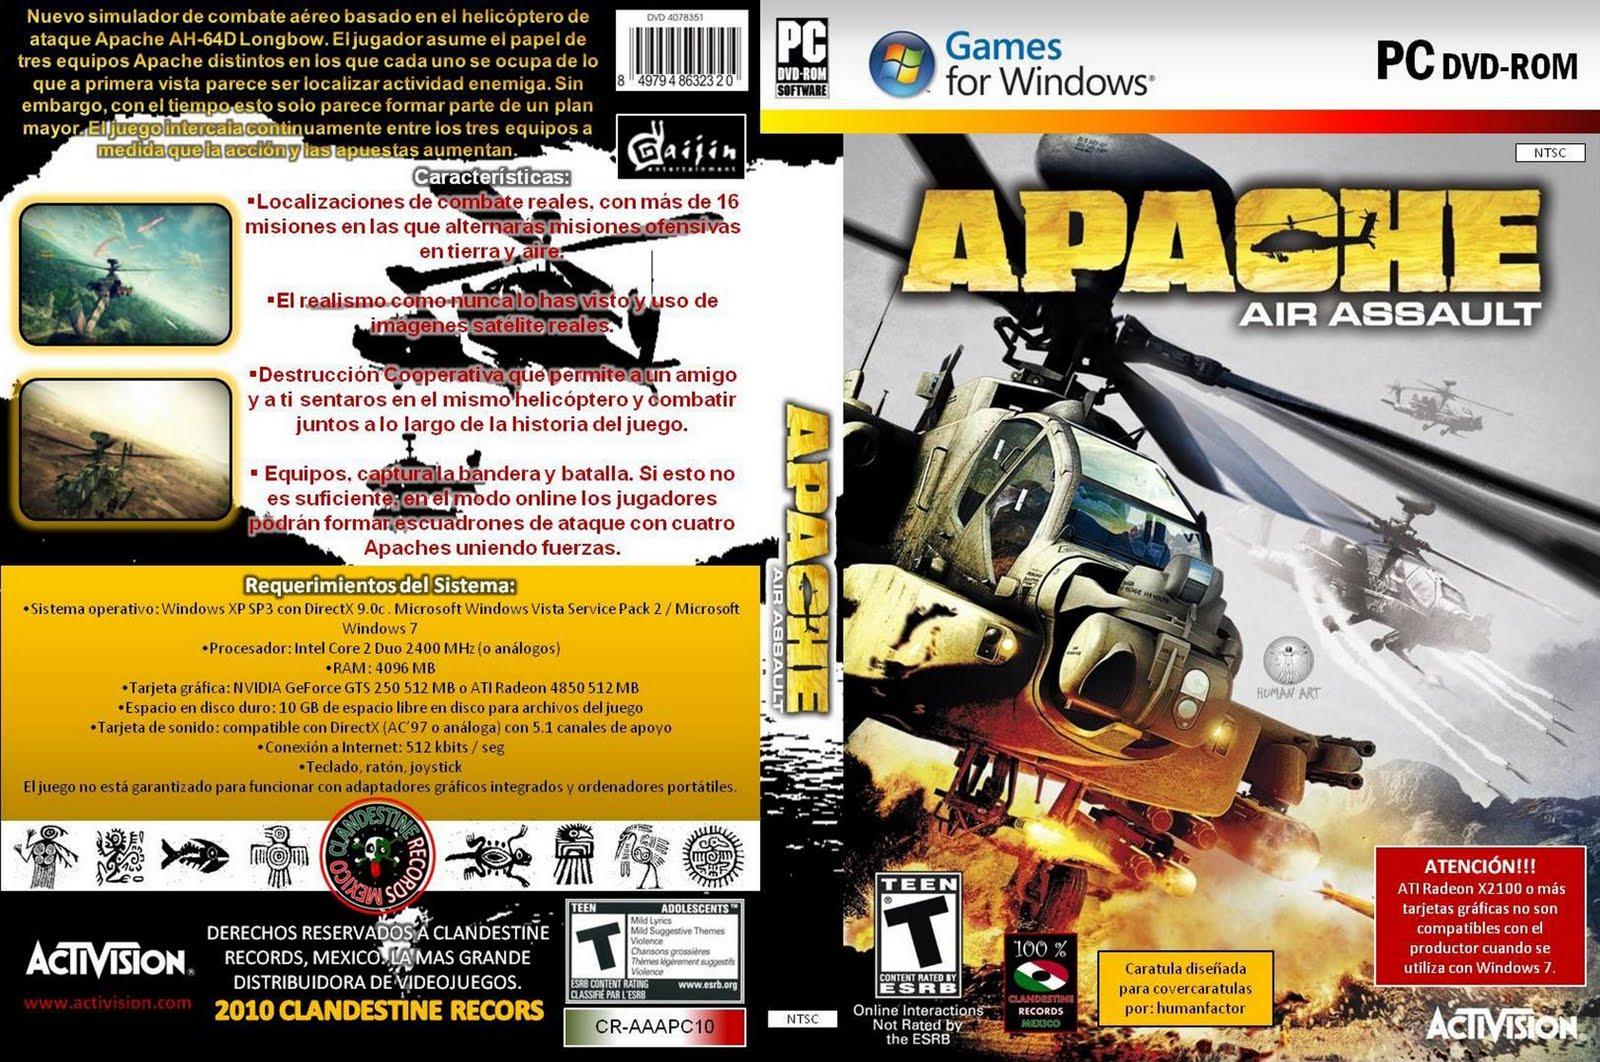 apache air assault version 1 0 0 1 1 3 gb full reloaded apache air